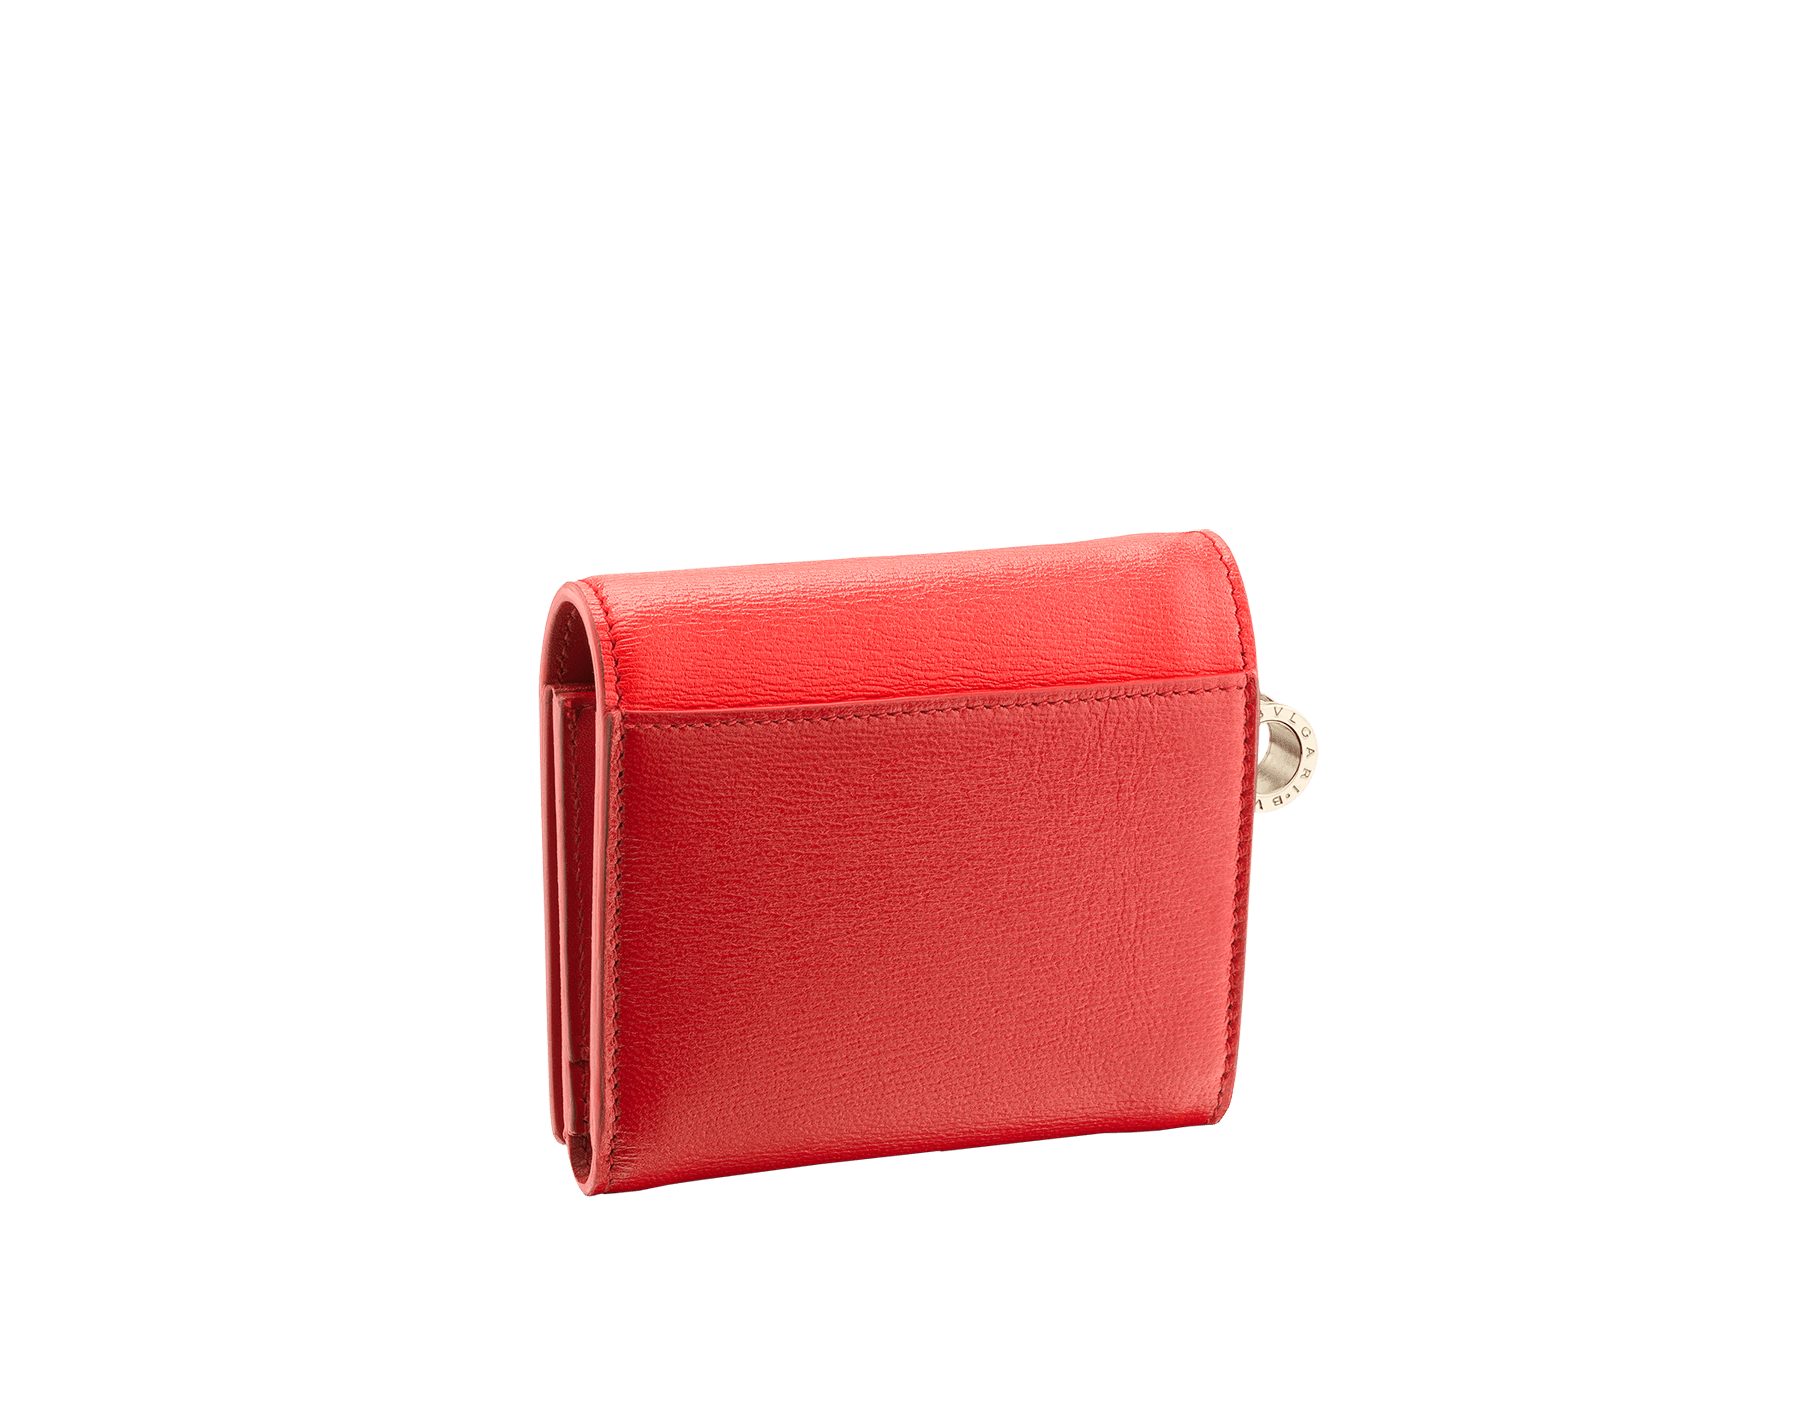 B.zero1 open credit card holder in sea star coral and carmine jasper goatskin. Iconic B.zero1 charm in light gold-plated brass. 288241 image 3